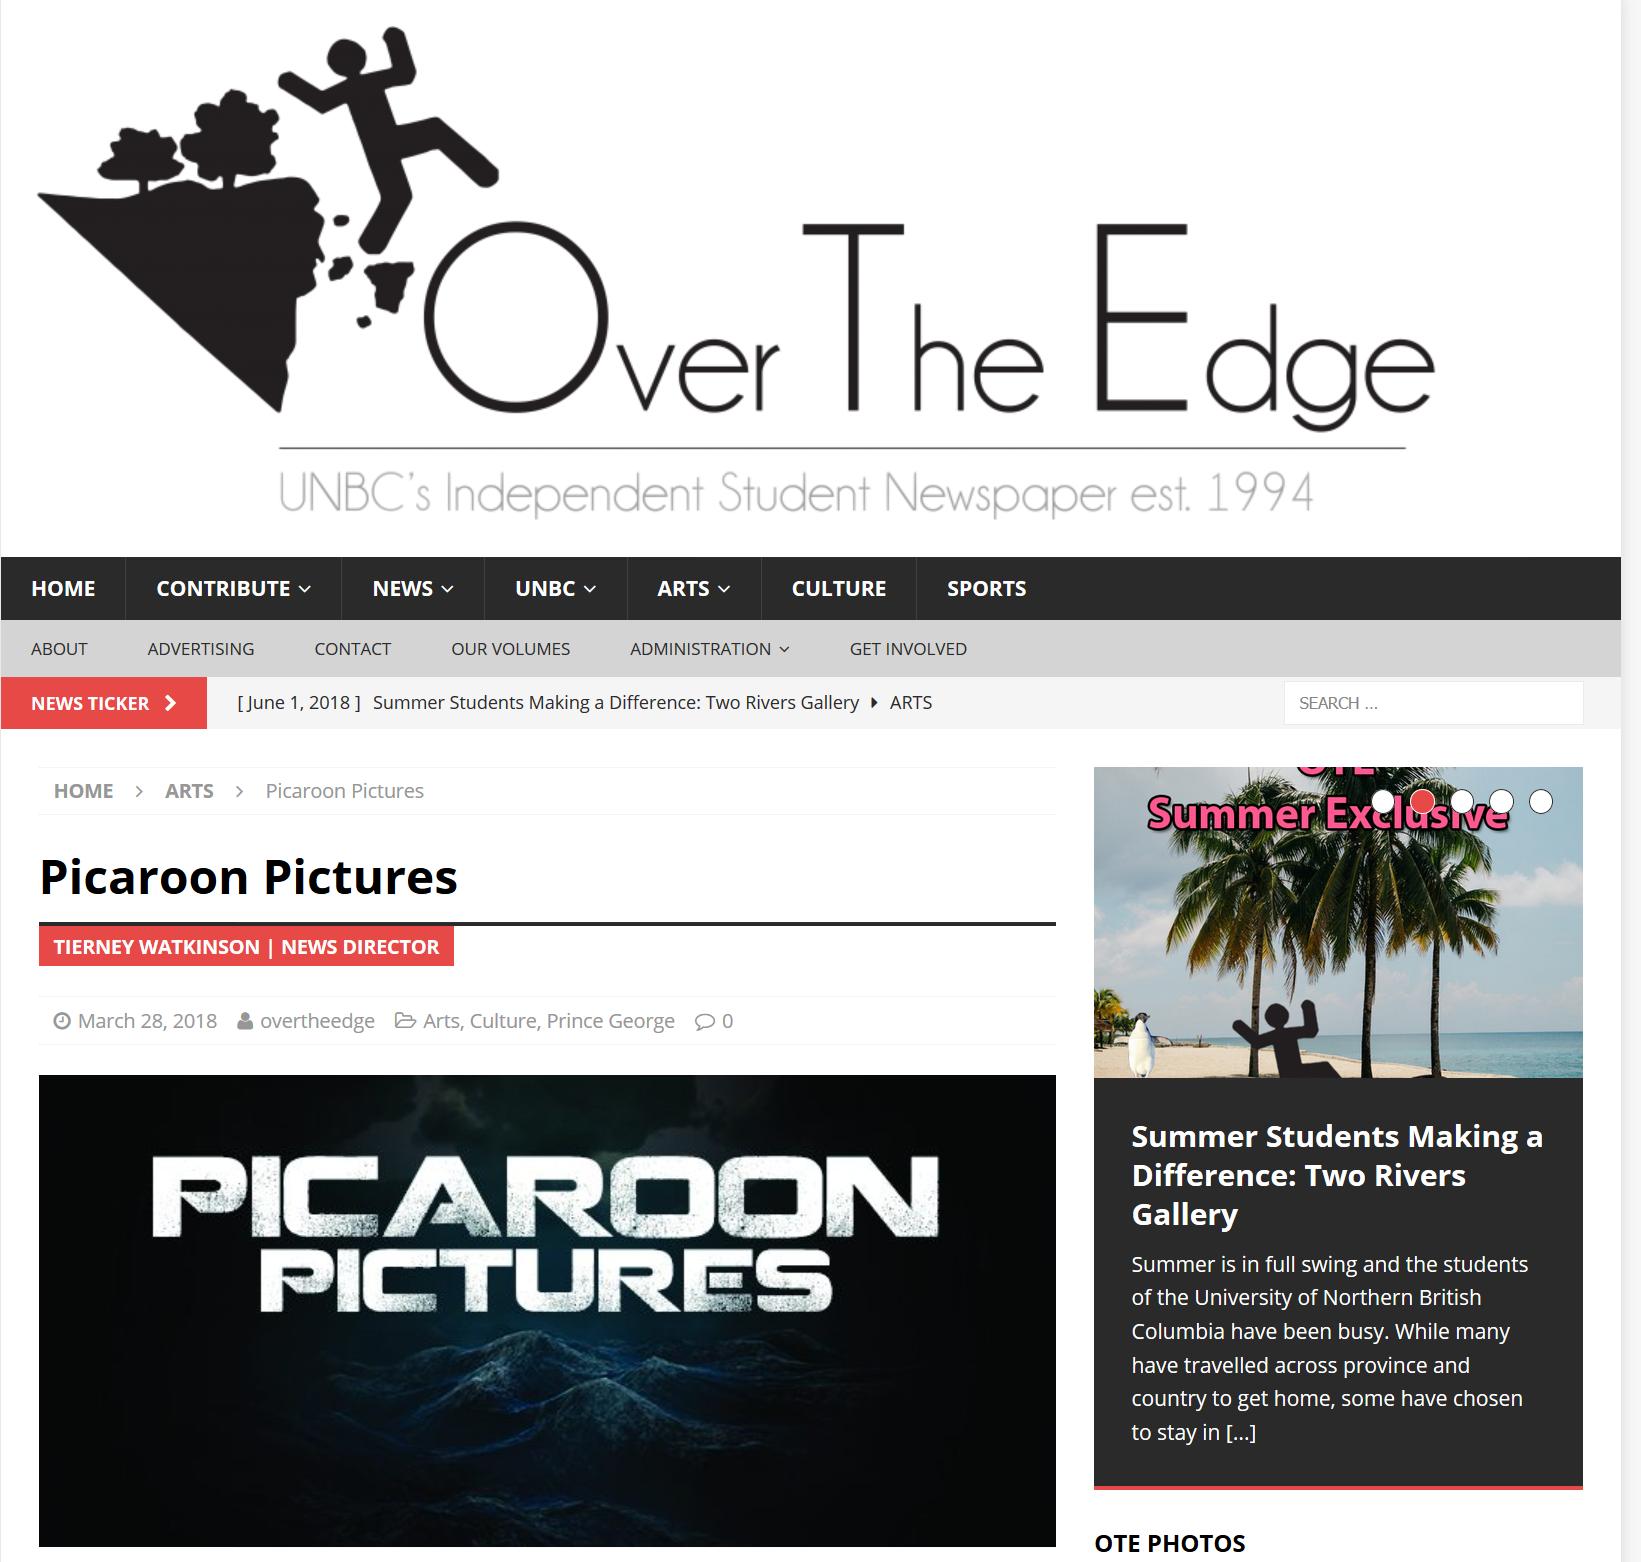 Over the Edge - Interviews Co-creator Jon Chuby -